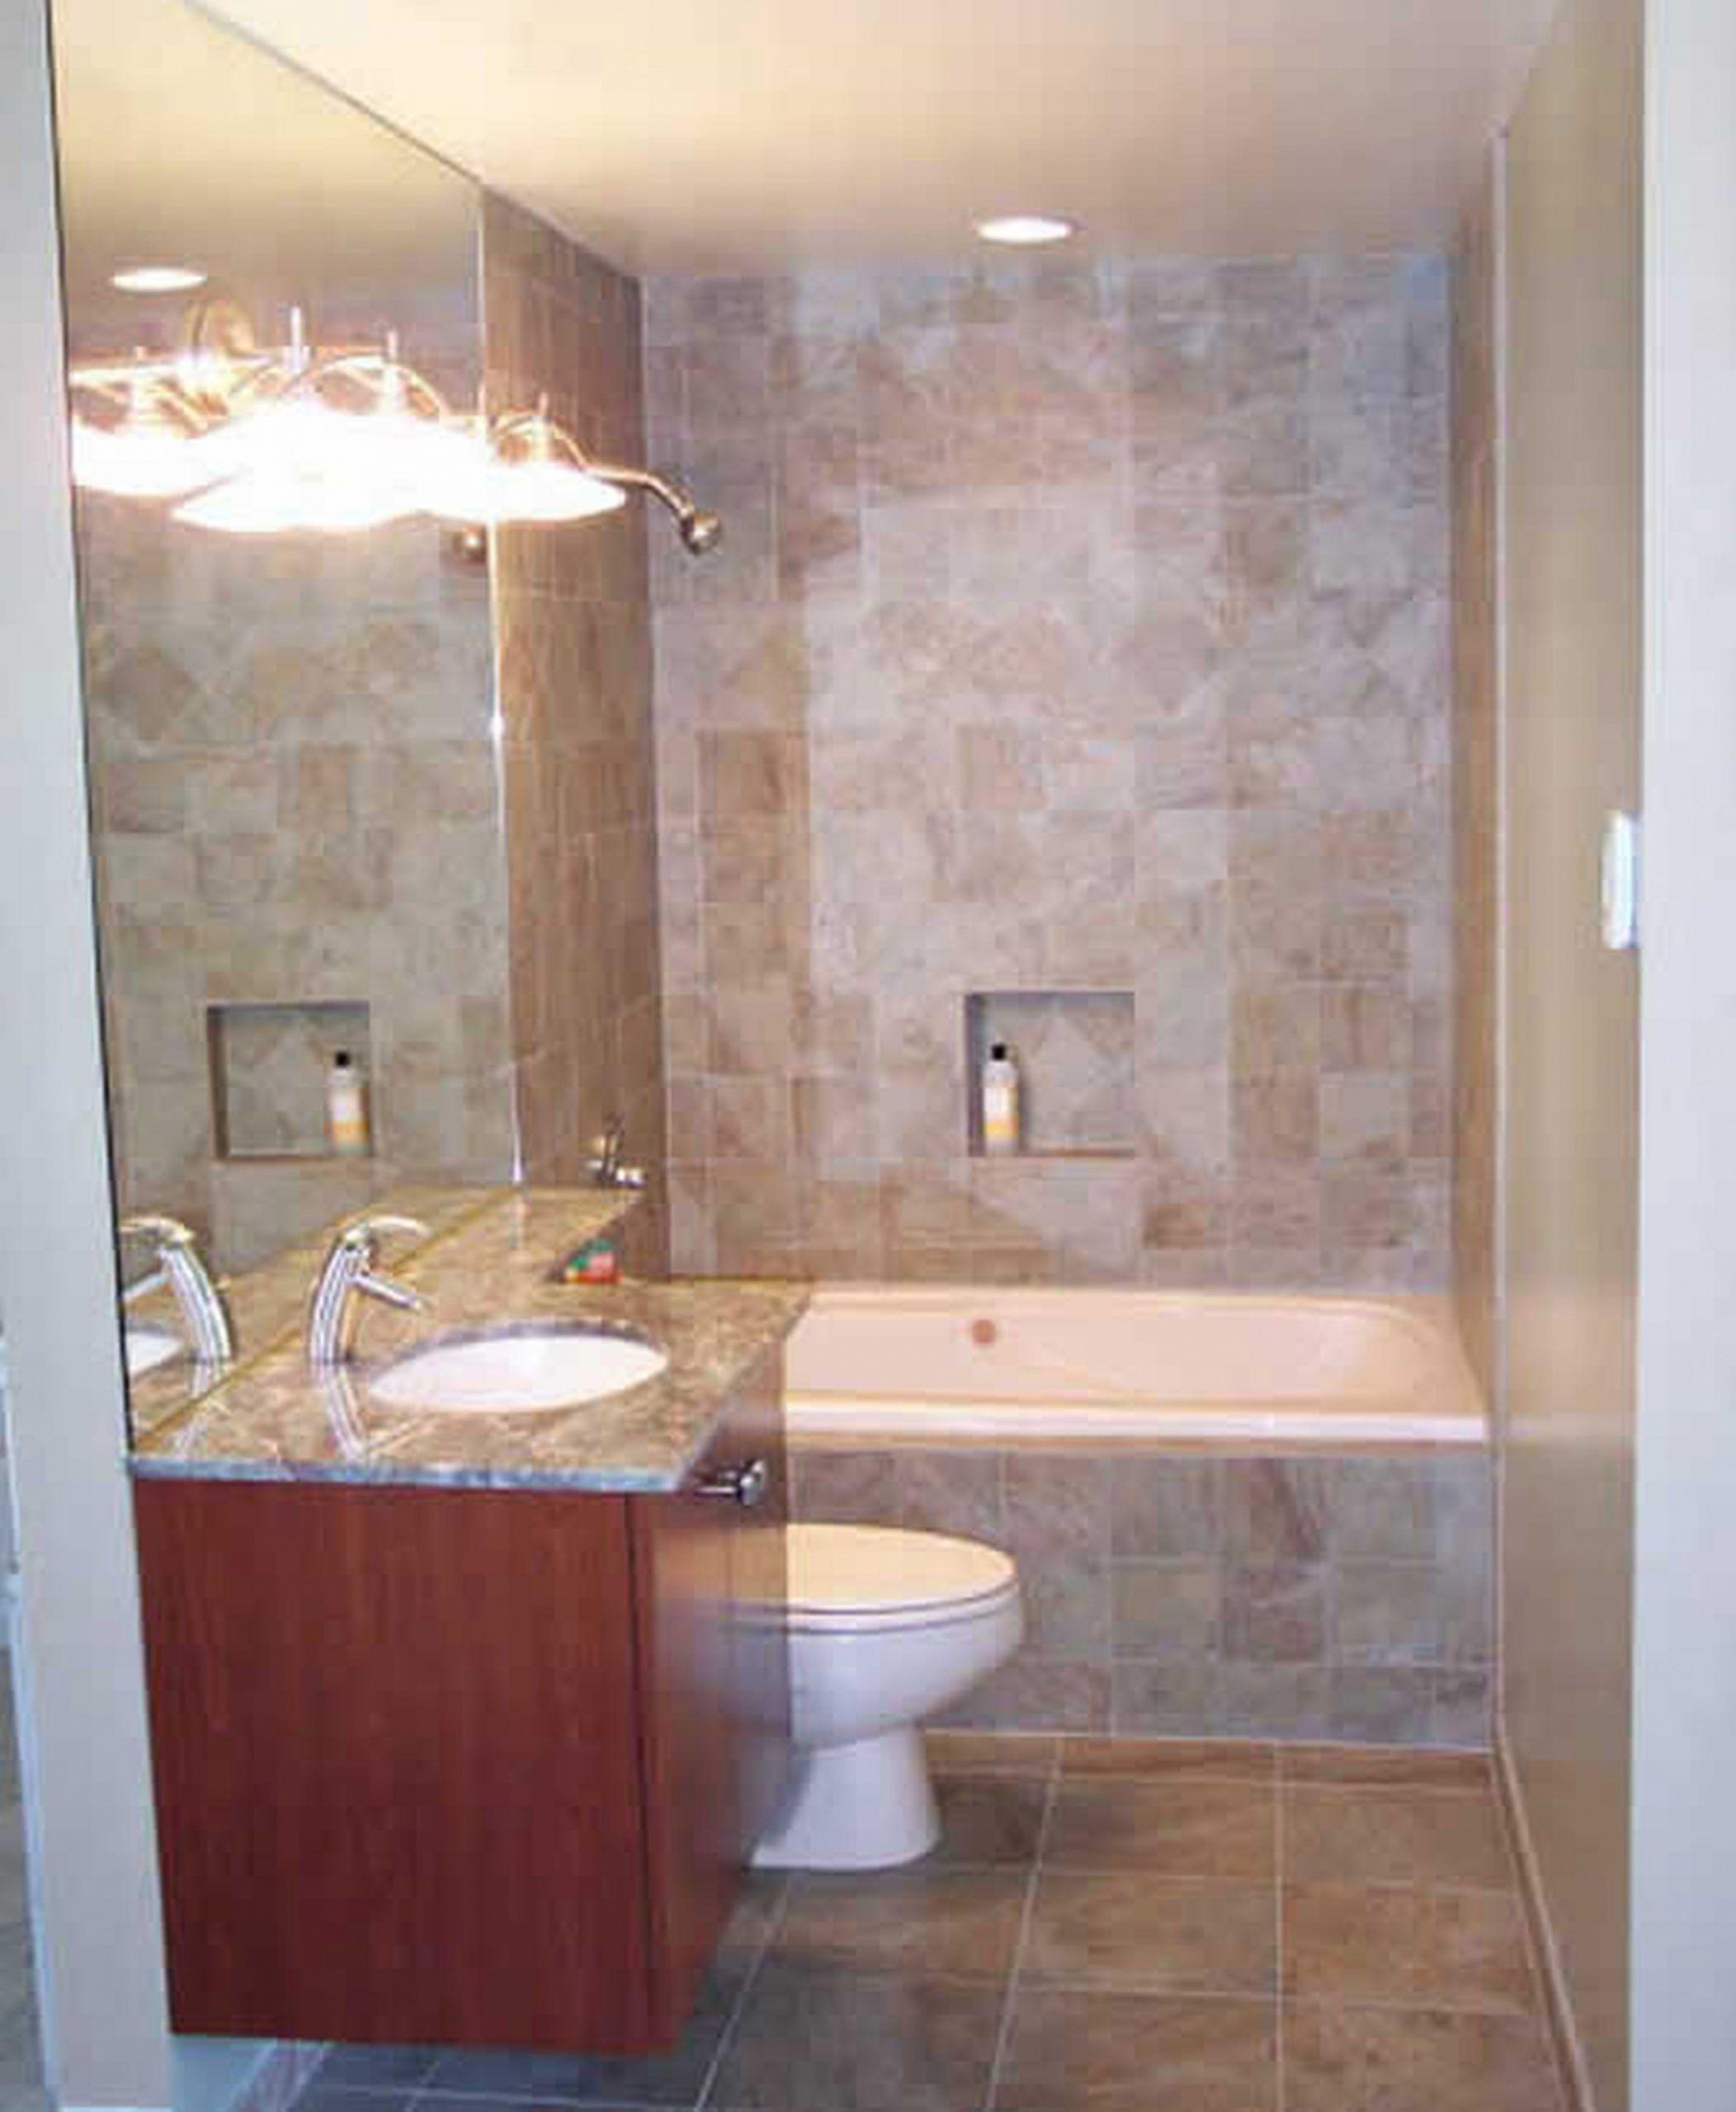 Rectangle Master Bathroom Ideas Inspired Bathroom Ideas Japanese Tubs Shower Combo Master Re In 2020 Bathroom Design Tool Small Bathroom Layout Simple Bathroom Designs